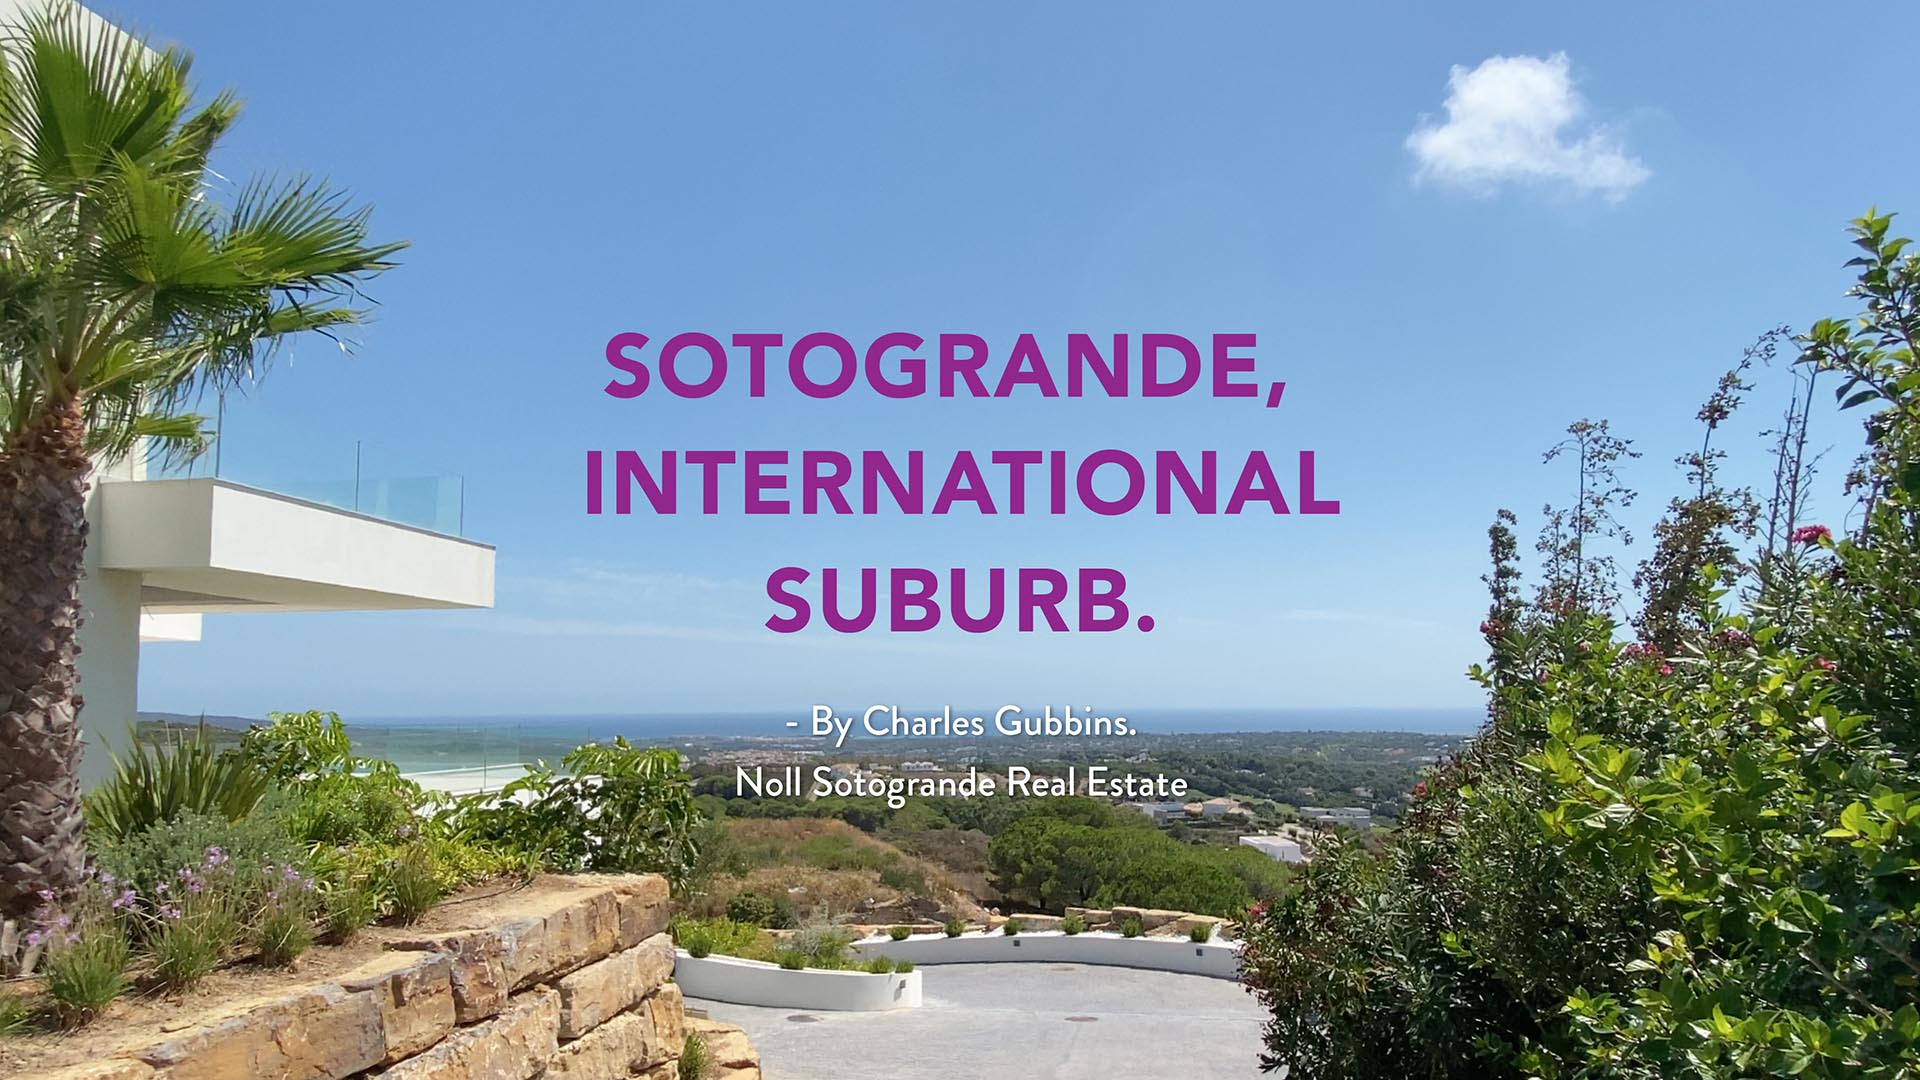 Sotogrande, an international suburb